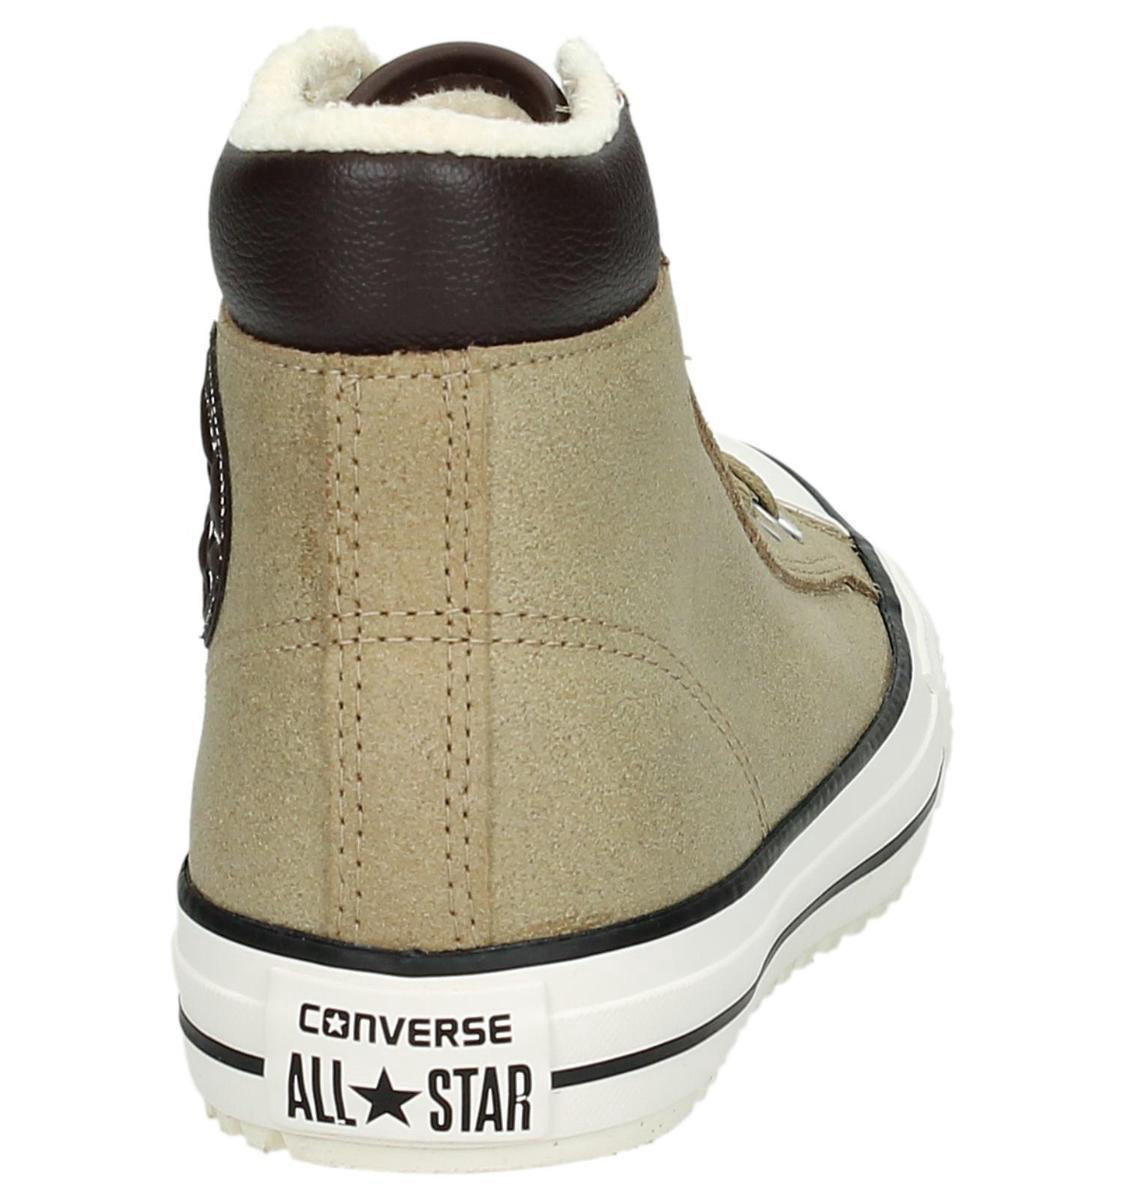   Converse As Boot 2.0 Sneaker hoog Heren Sand